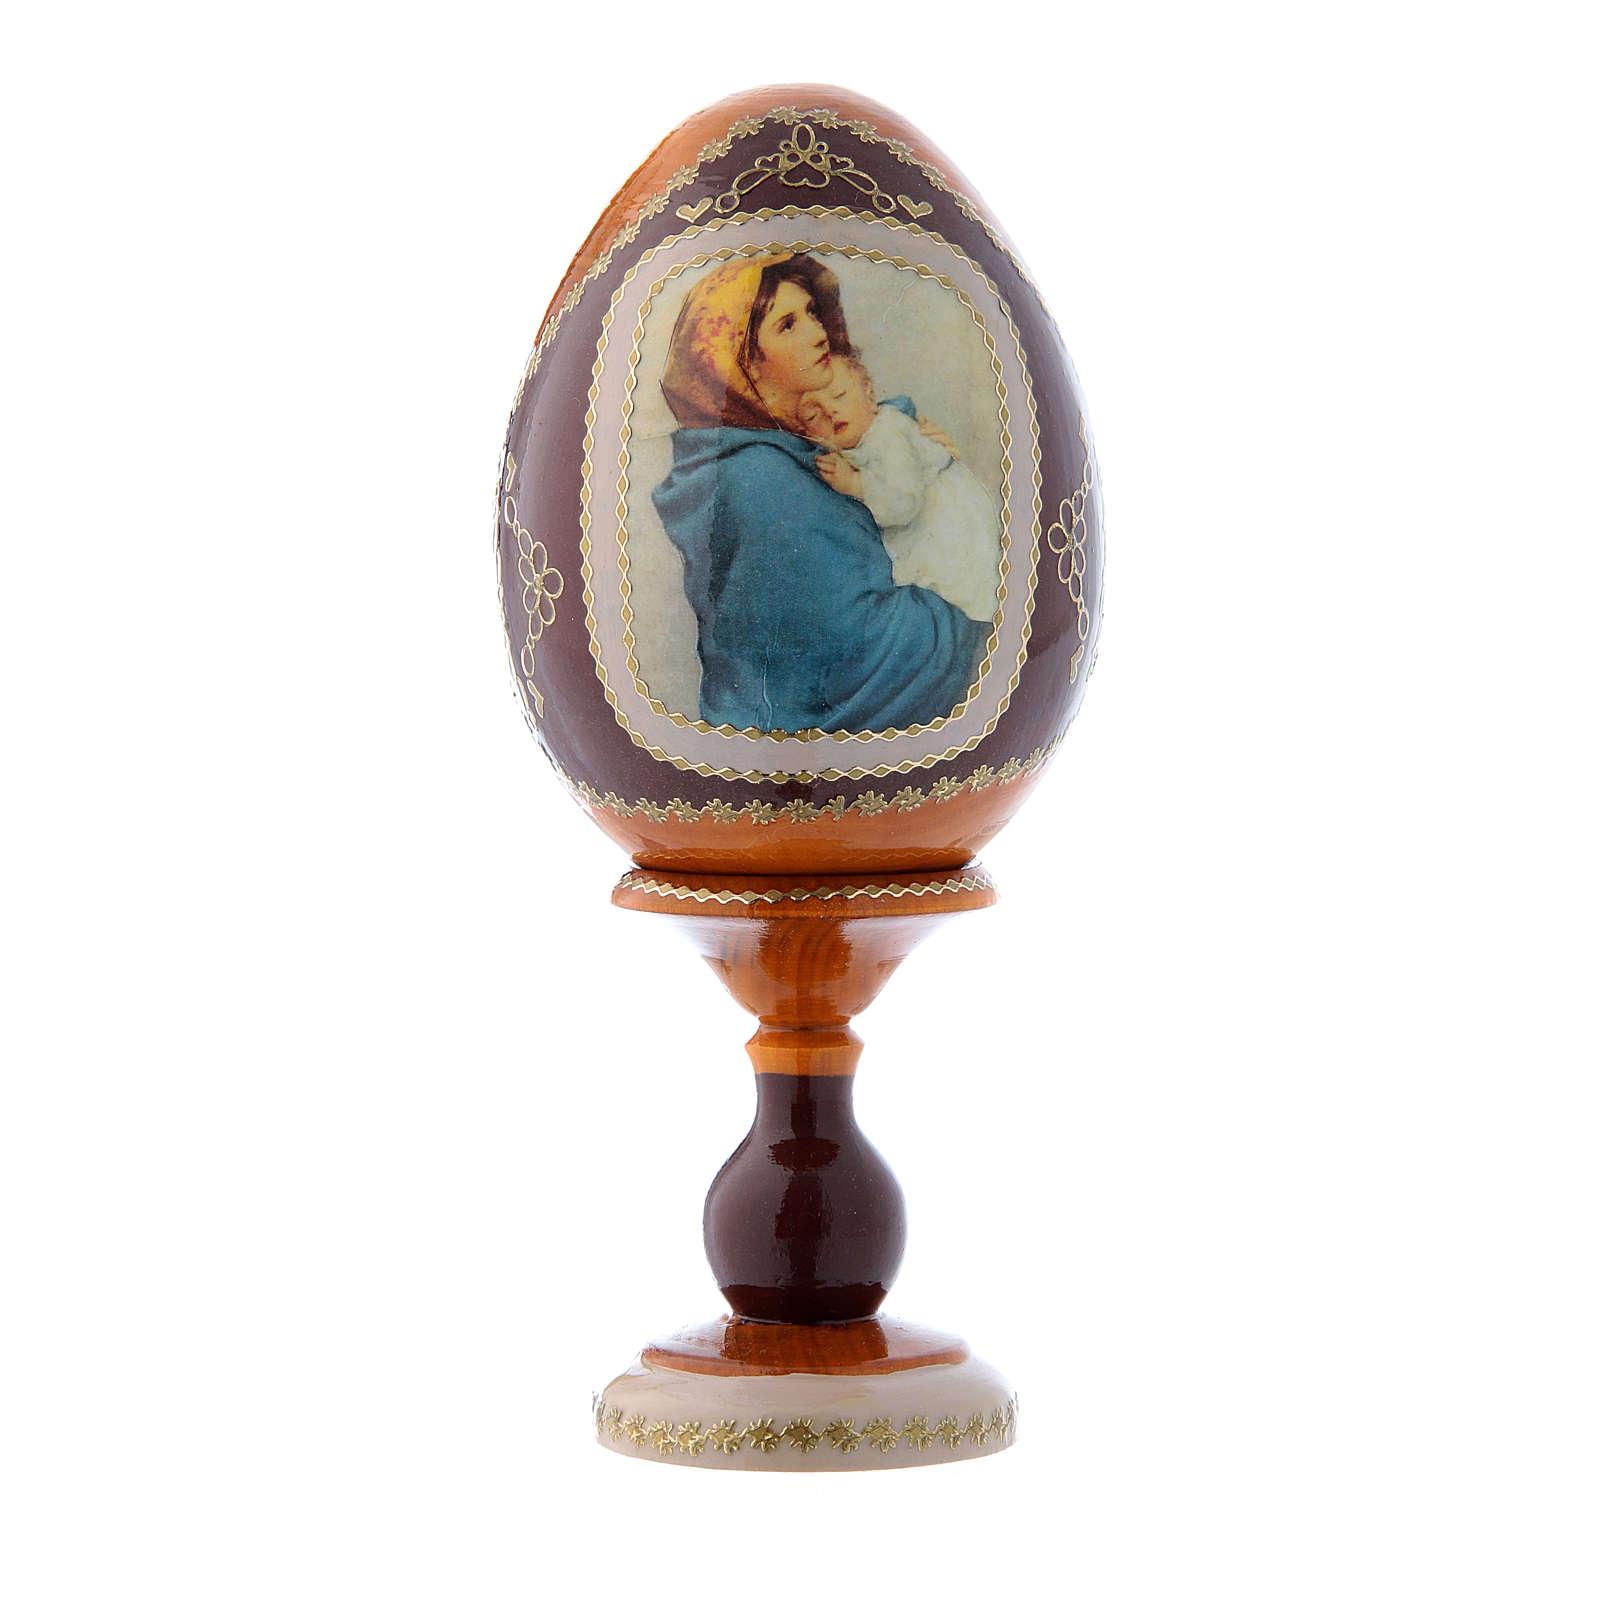 Uovo russo giallo découpage La Madonnina h tot 16 cm 4